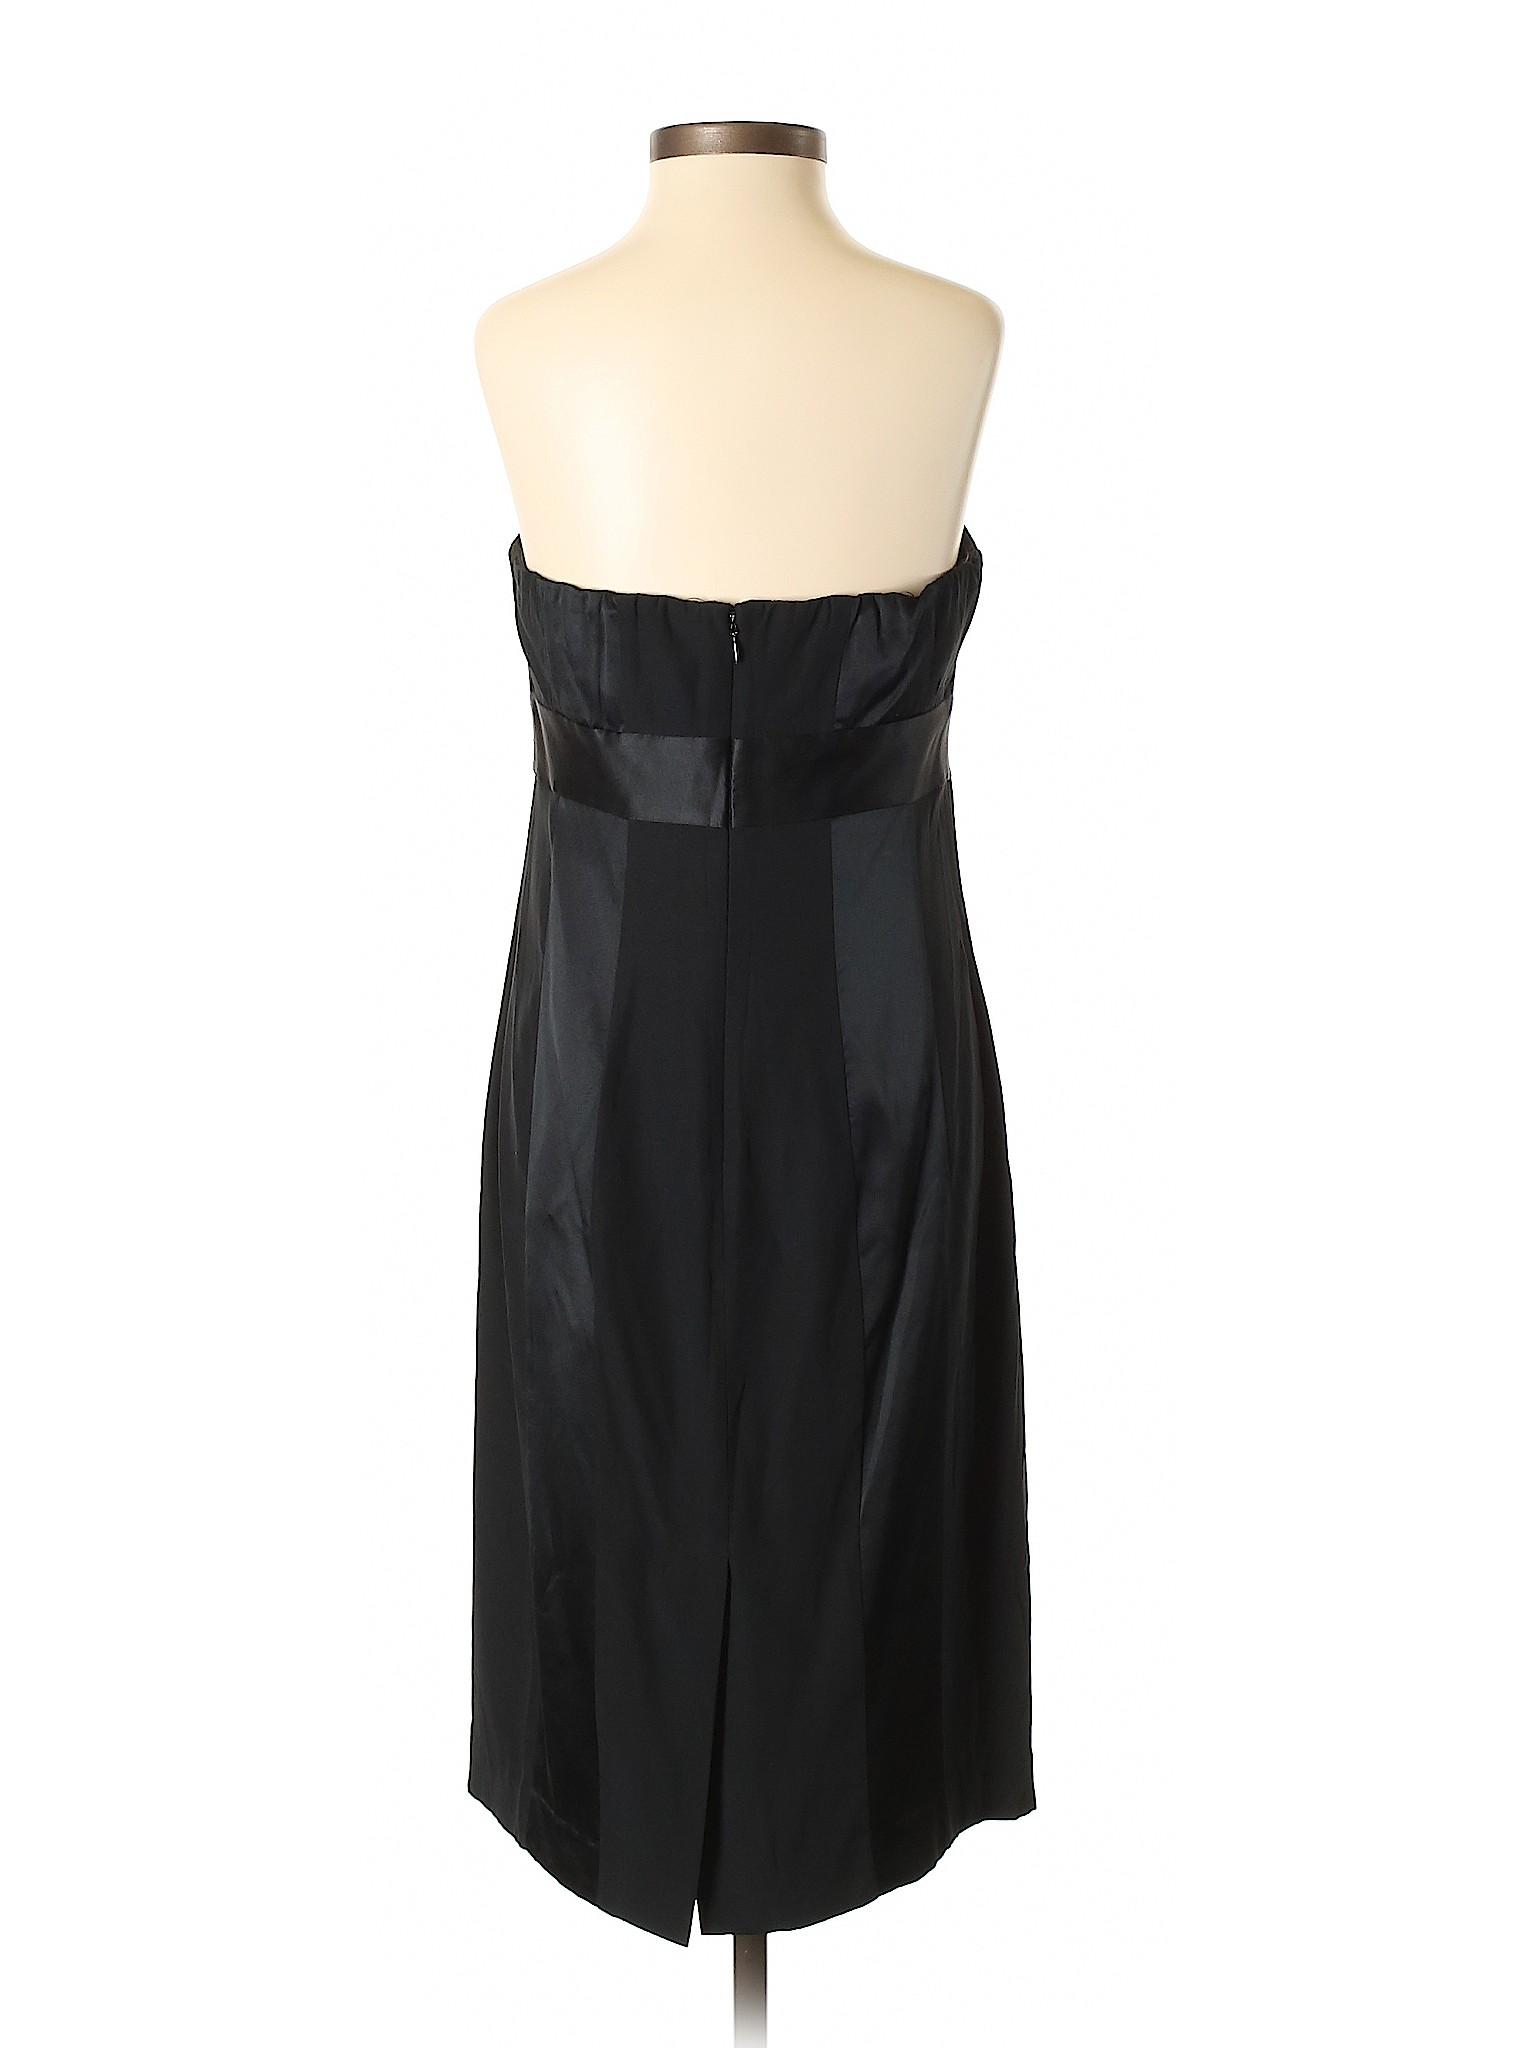 Cocktail Studio Selling Express Dress Design 7qXOXwt8